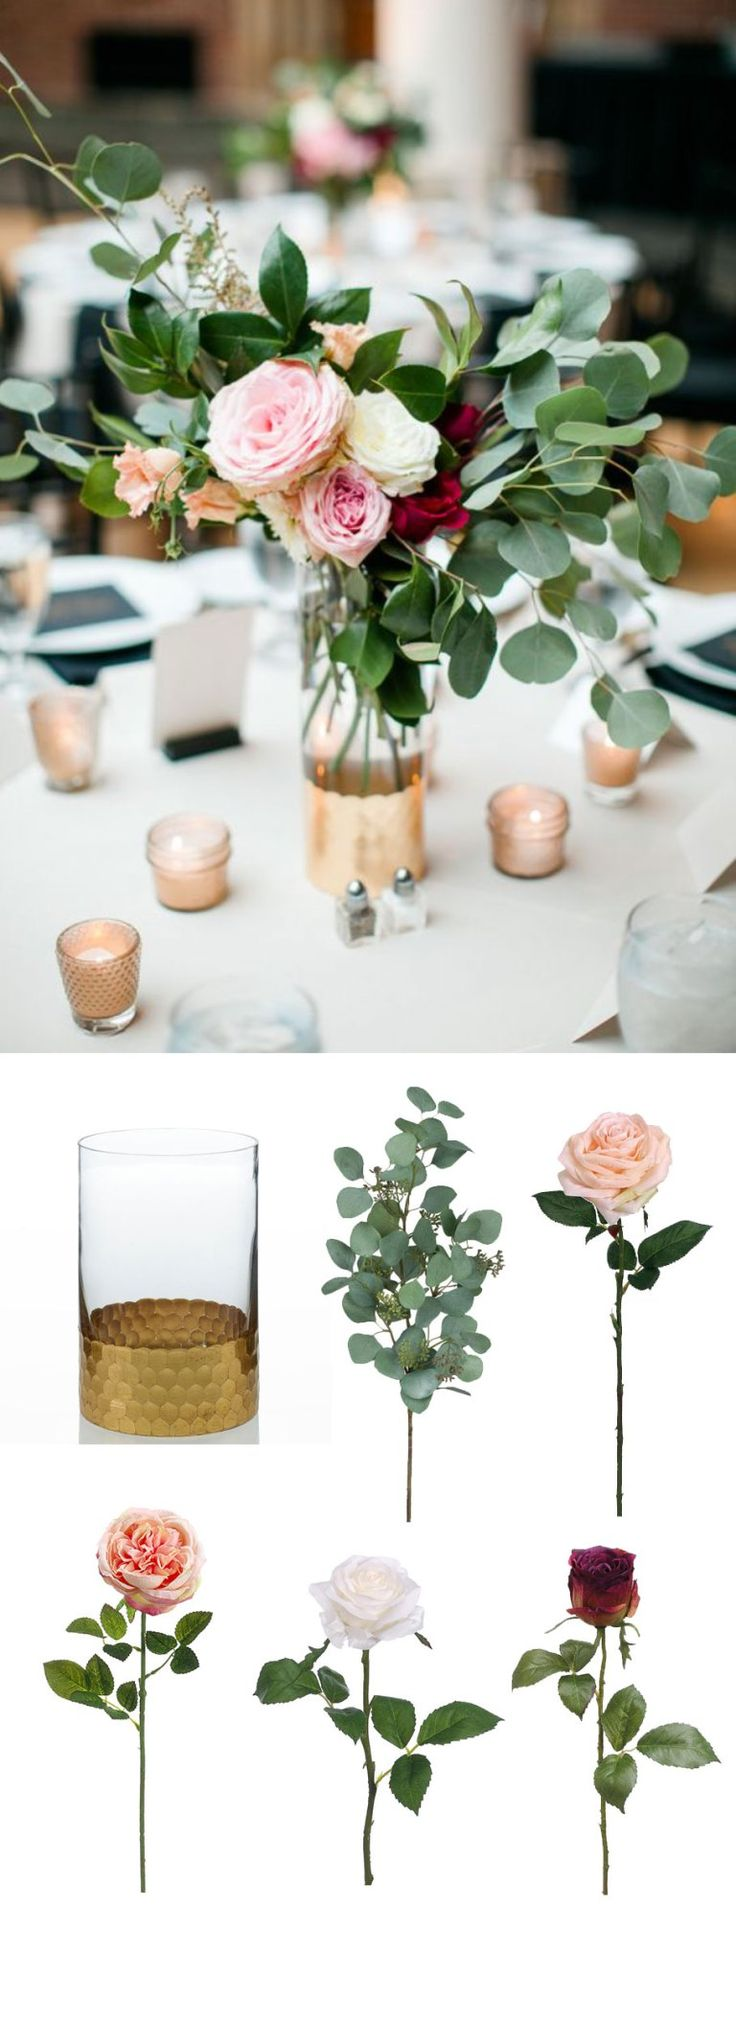 Enchanting Wedding Candle Centerpiece Ideas Adornment - Wedding Idea ...